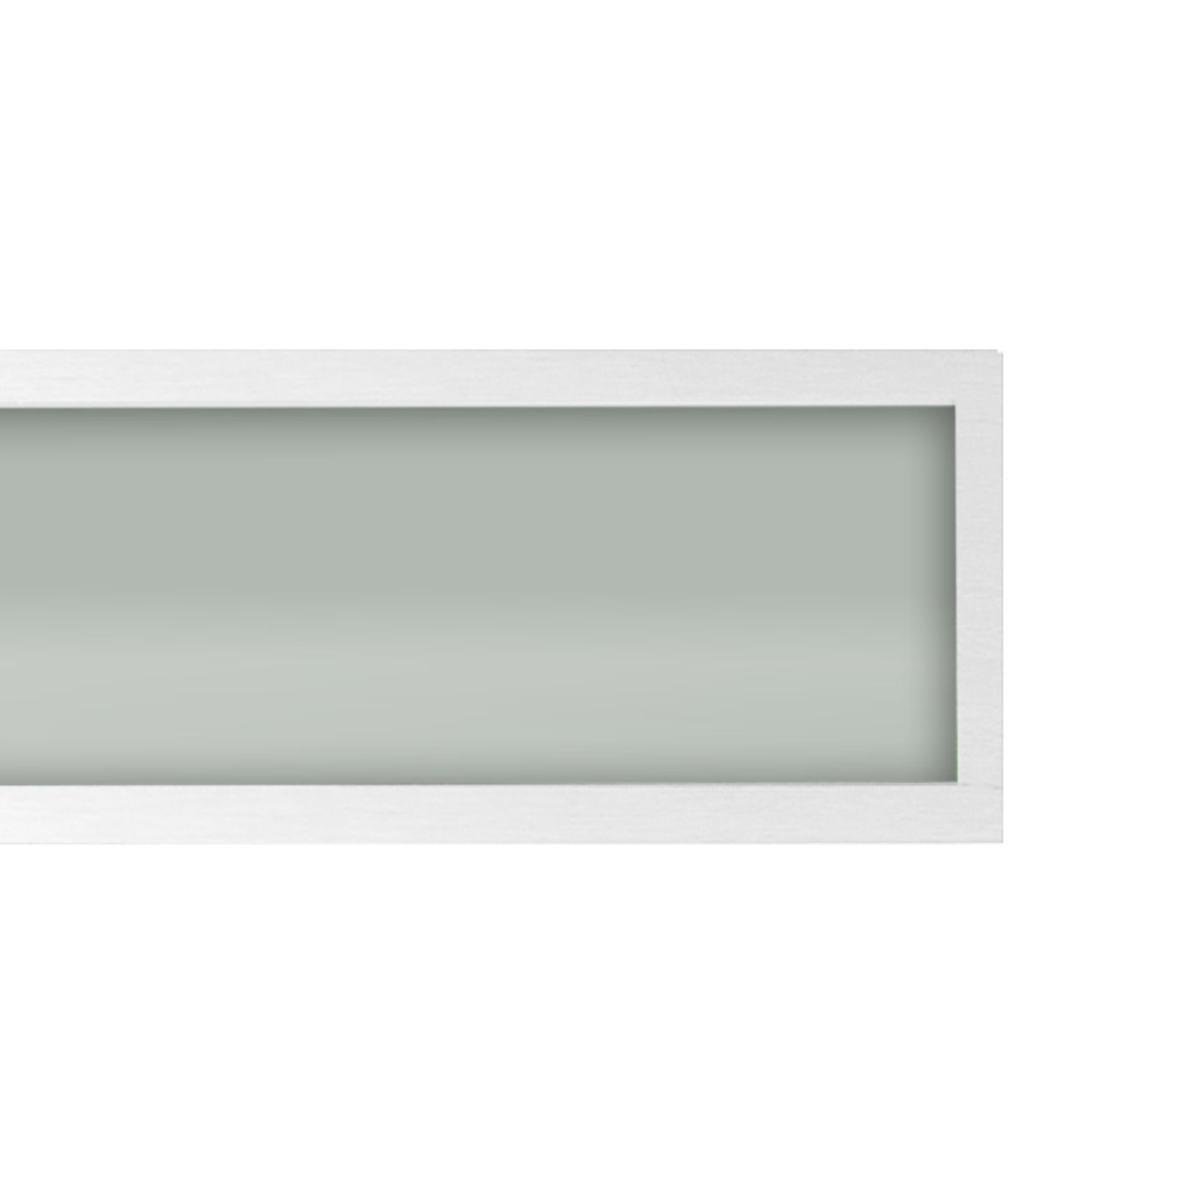 Plafon Space Emb. Ret.   35cm Alum. Vidro Fosco E-27 2 Lamp. Max 60w Branco